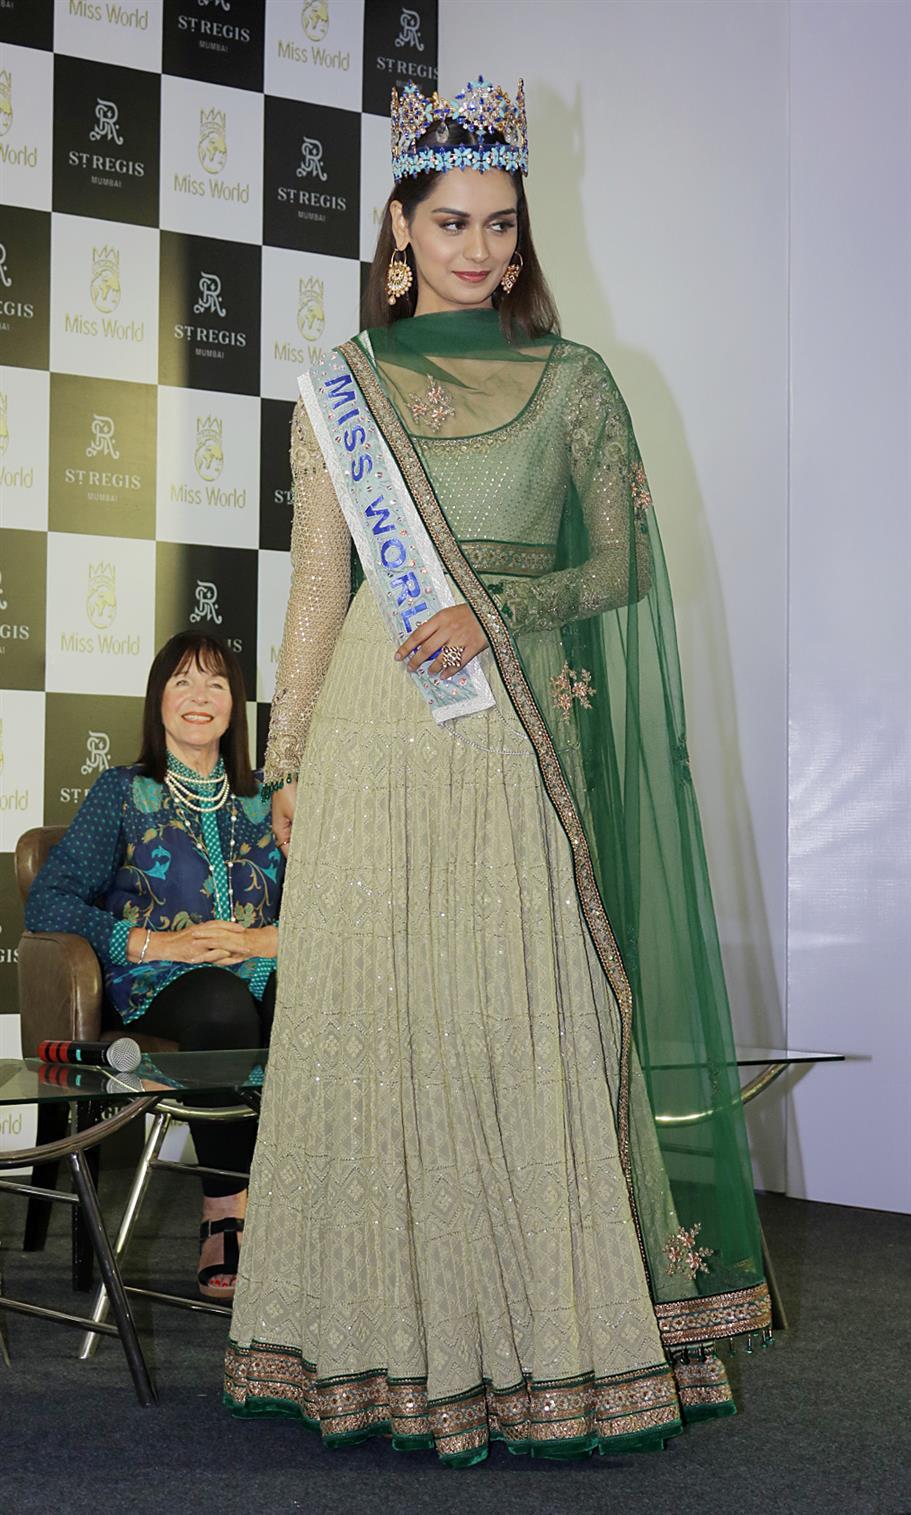 The Official Thread of Miss World 2017 ® Manushi Chhillar - India - Page 2 9H0DTA5XIBmanushi%20main2